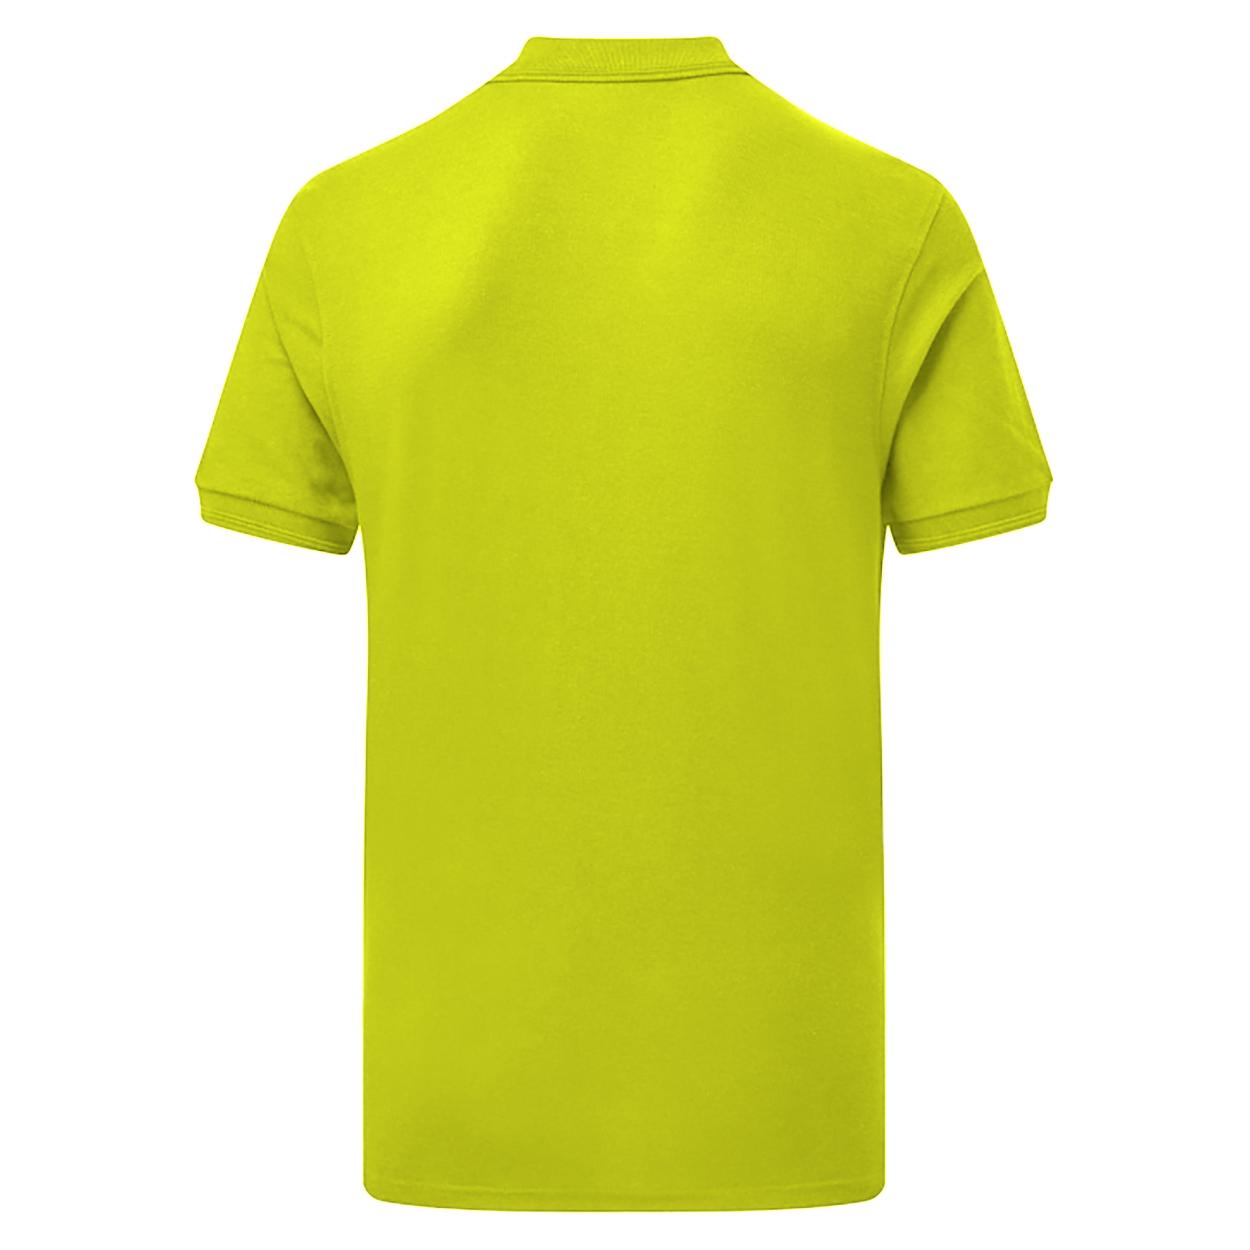 SG Mens Polycotton Short Sleeve Polo Shirt (M) (Sunflower)